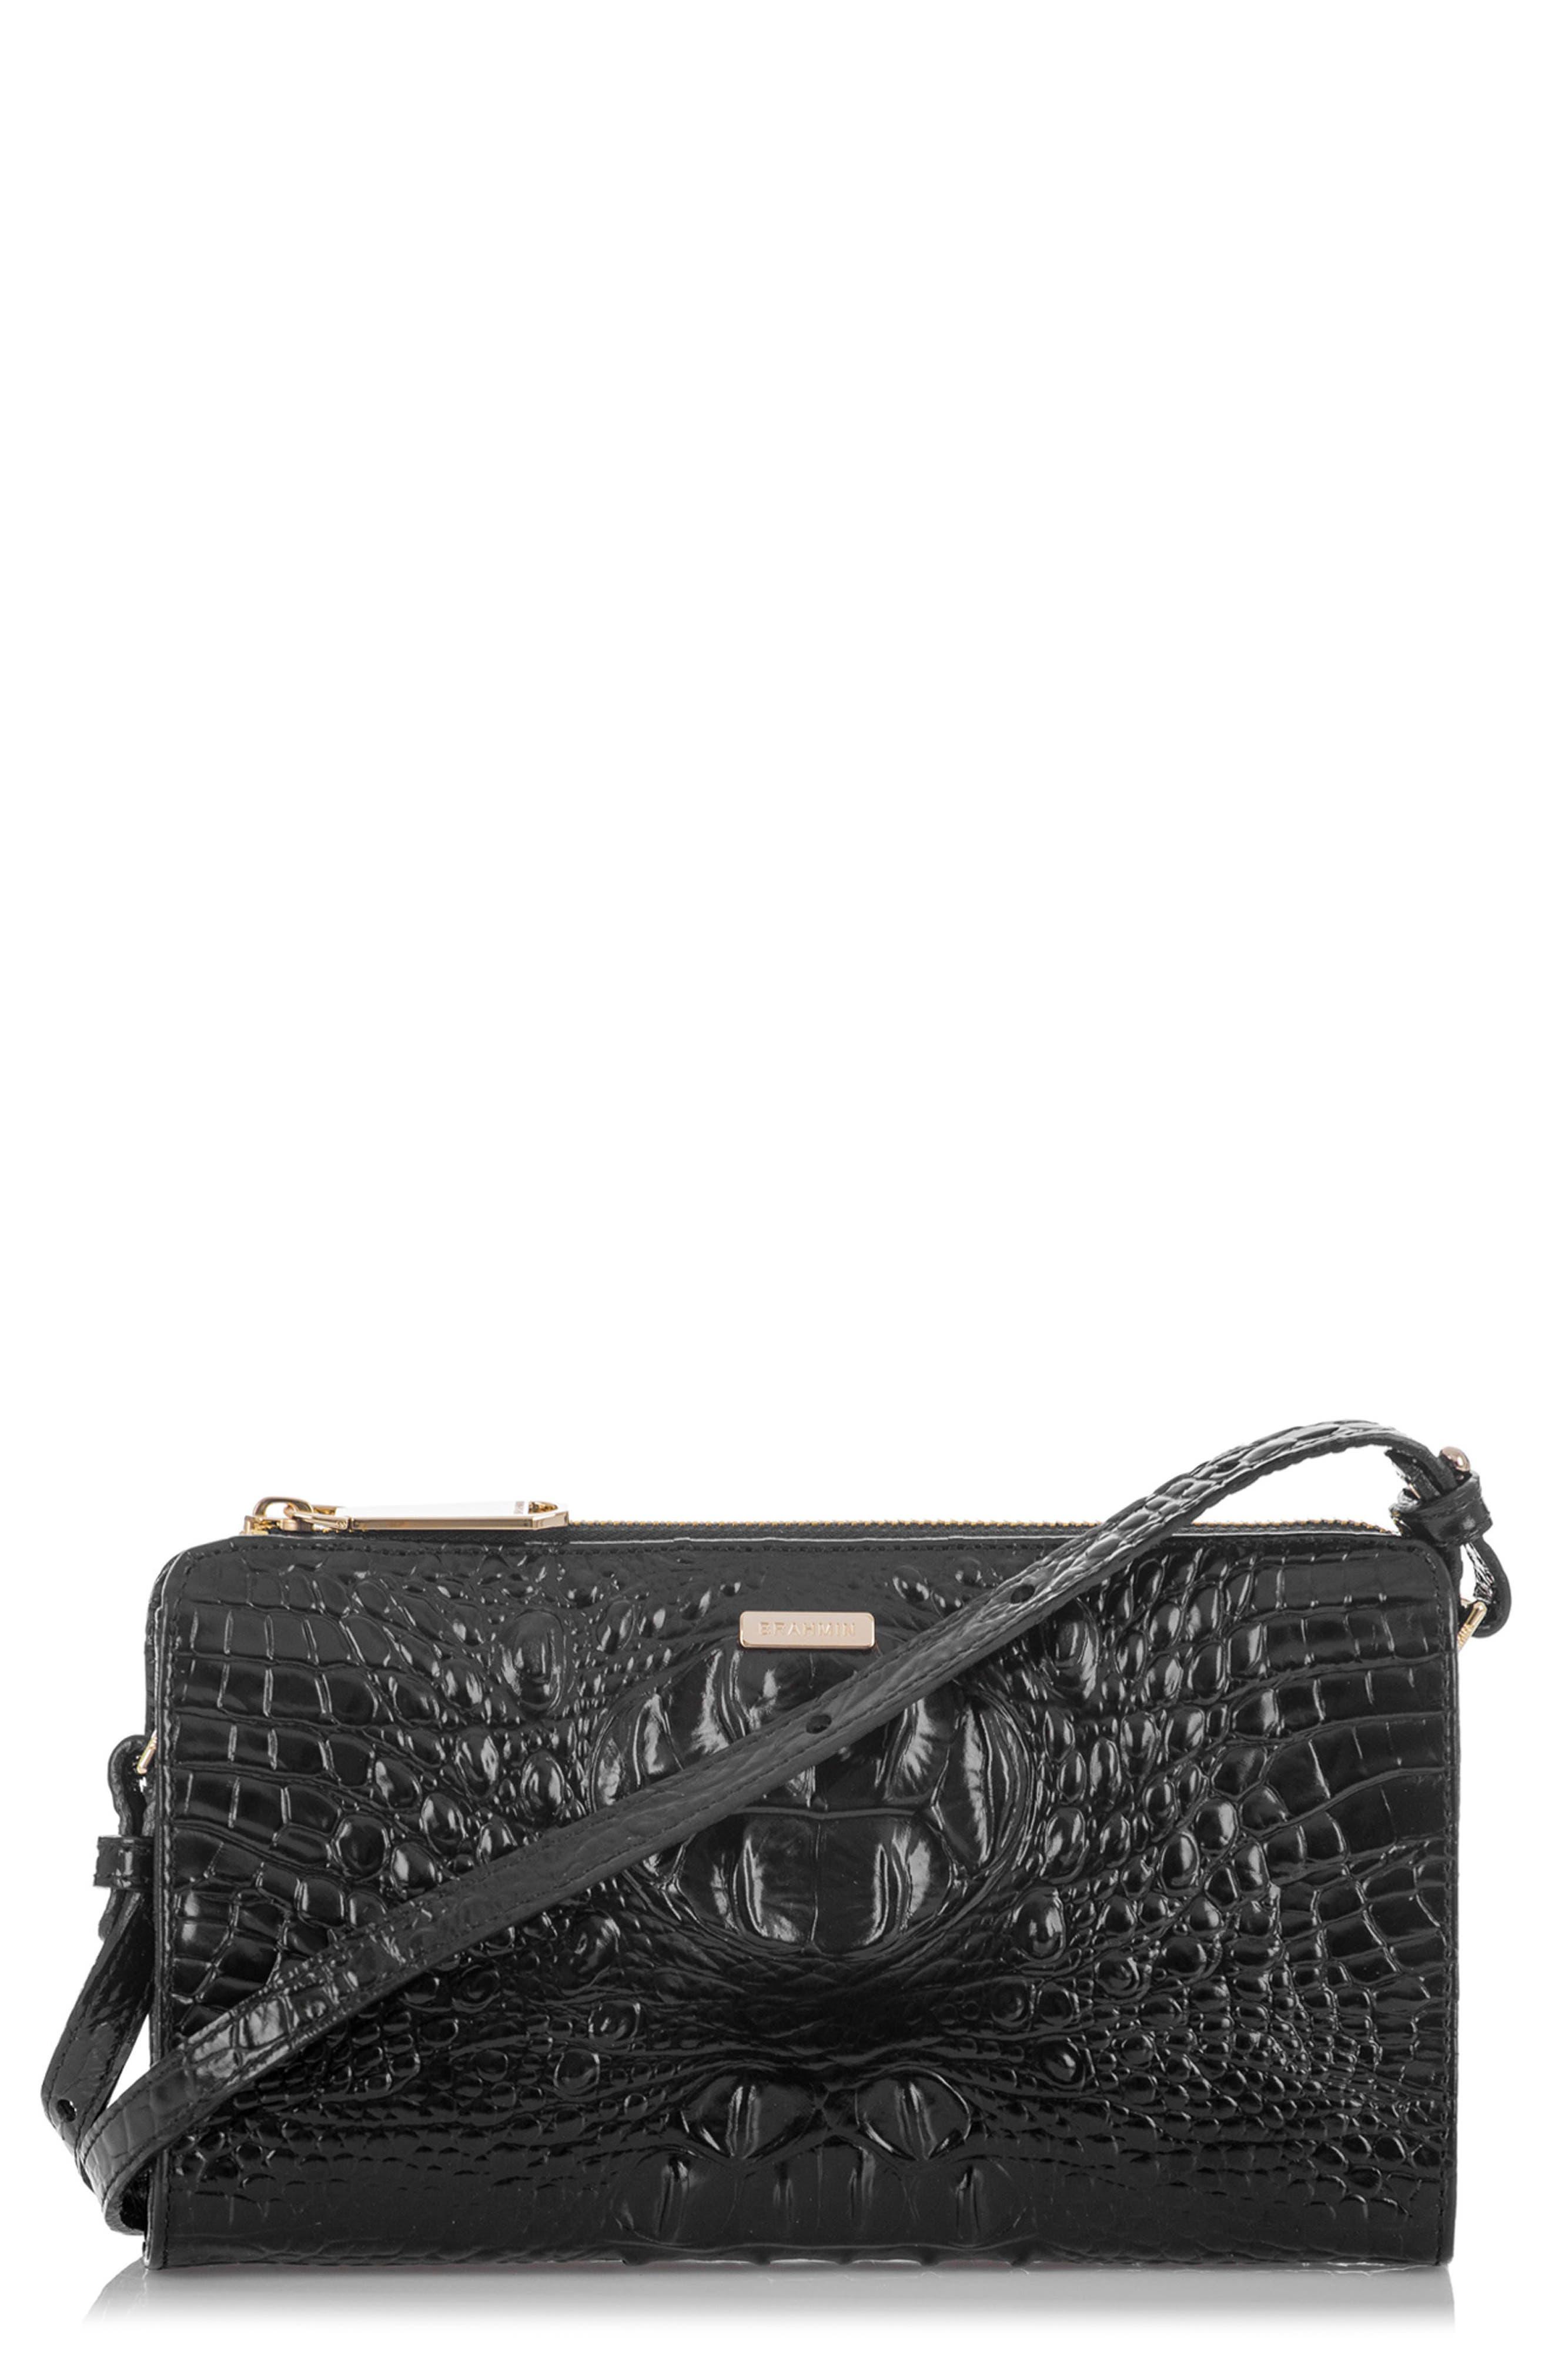 Sienna Leather Crossbody Bag,                         Main,                         color, Black